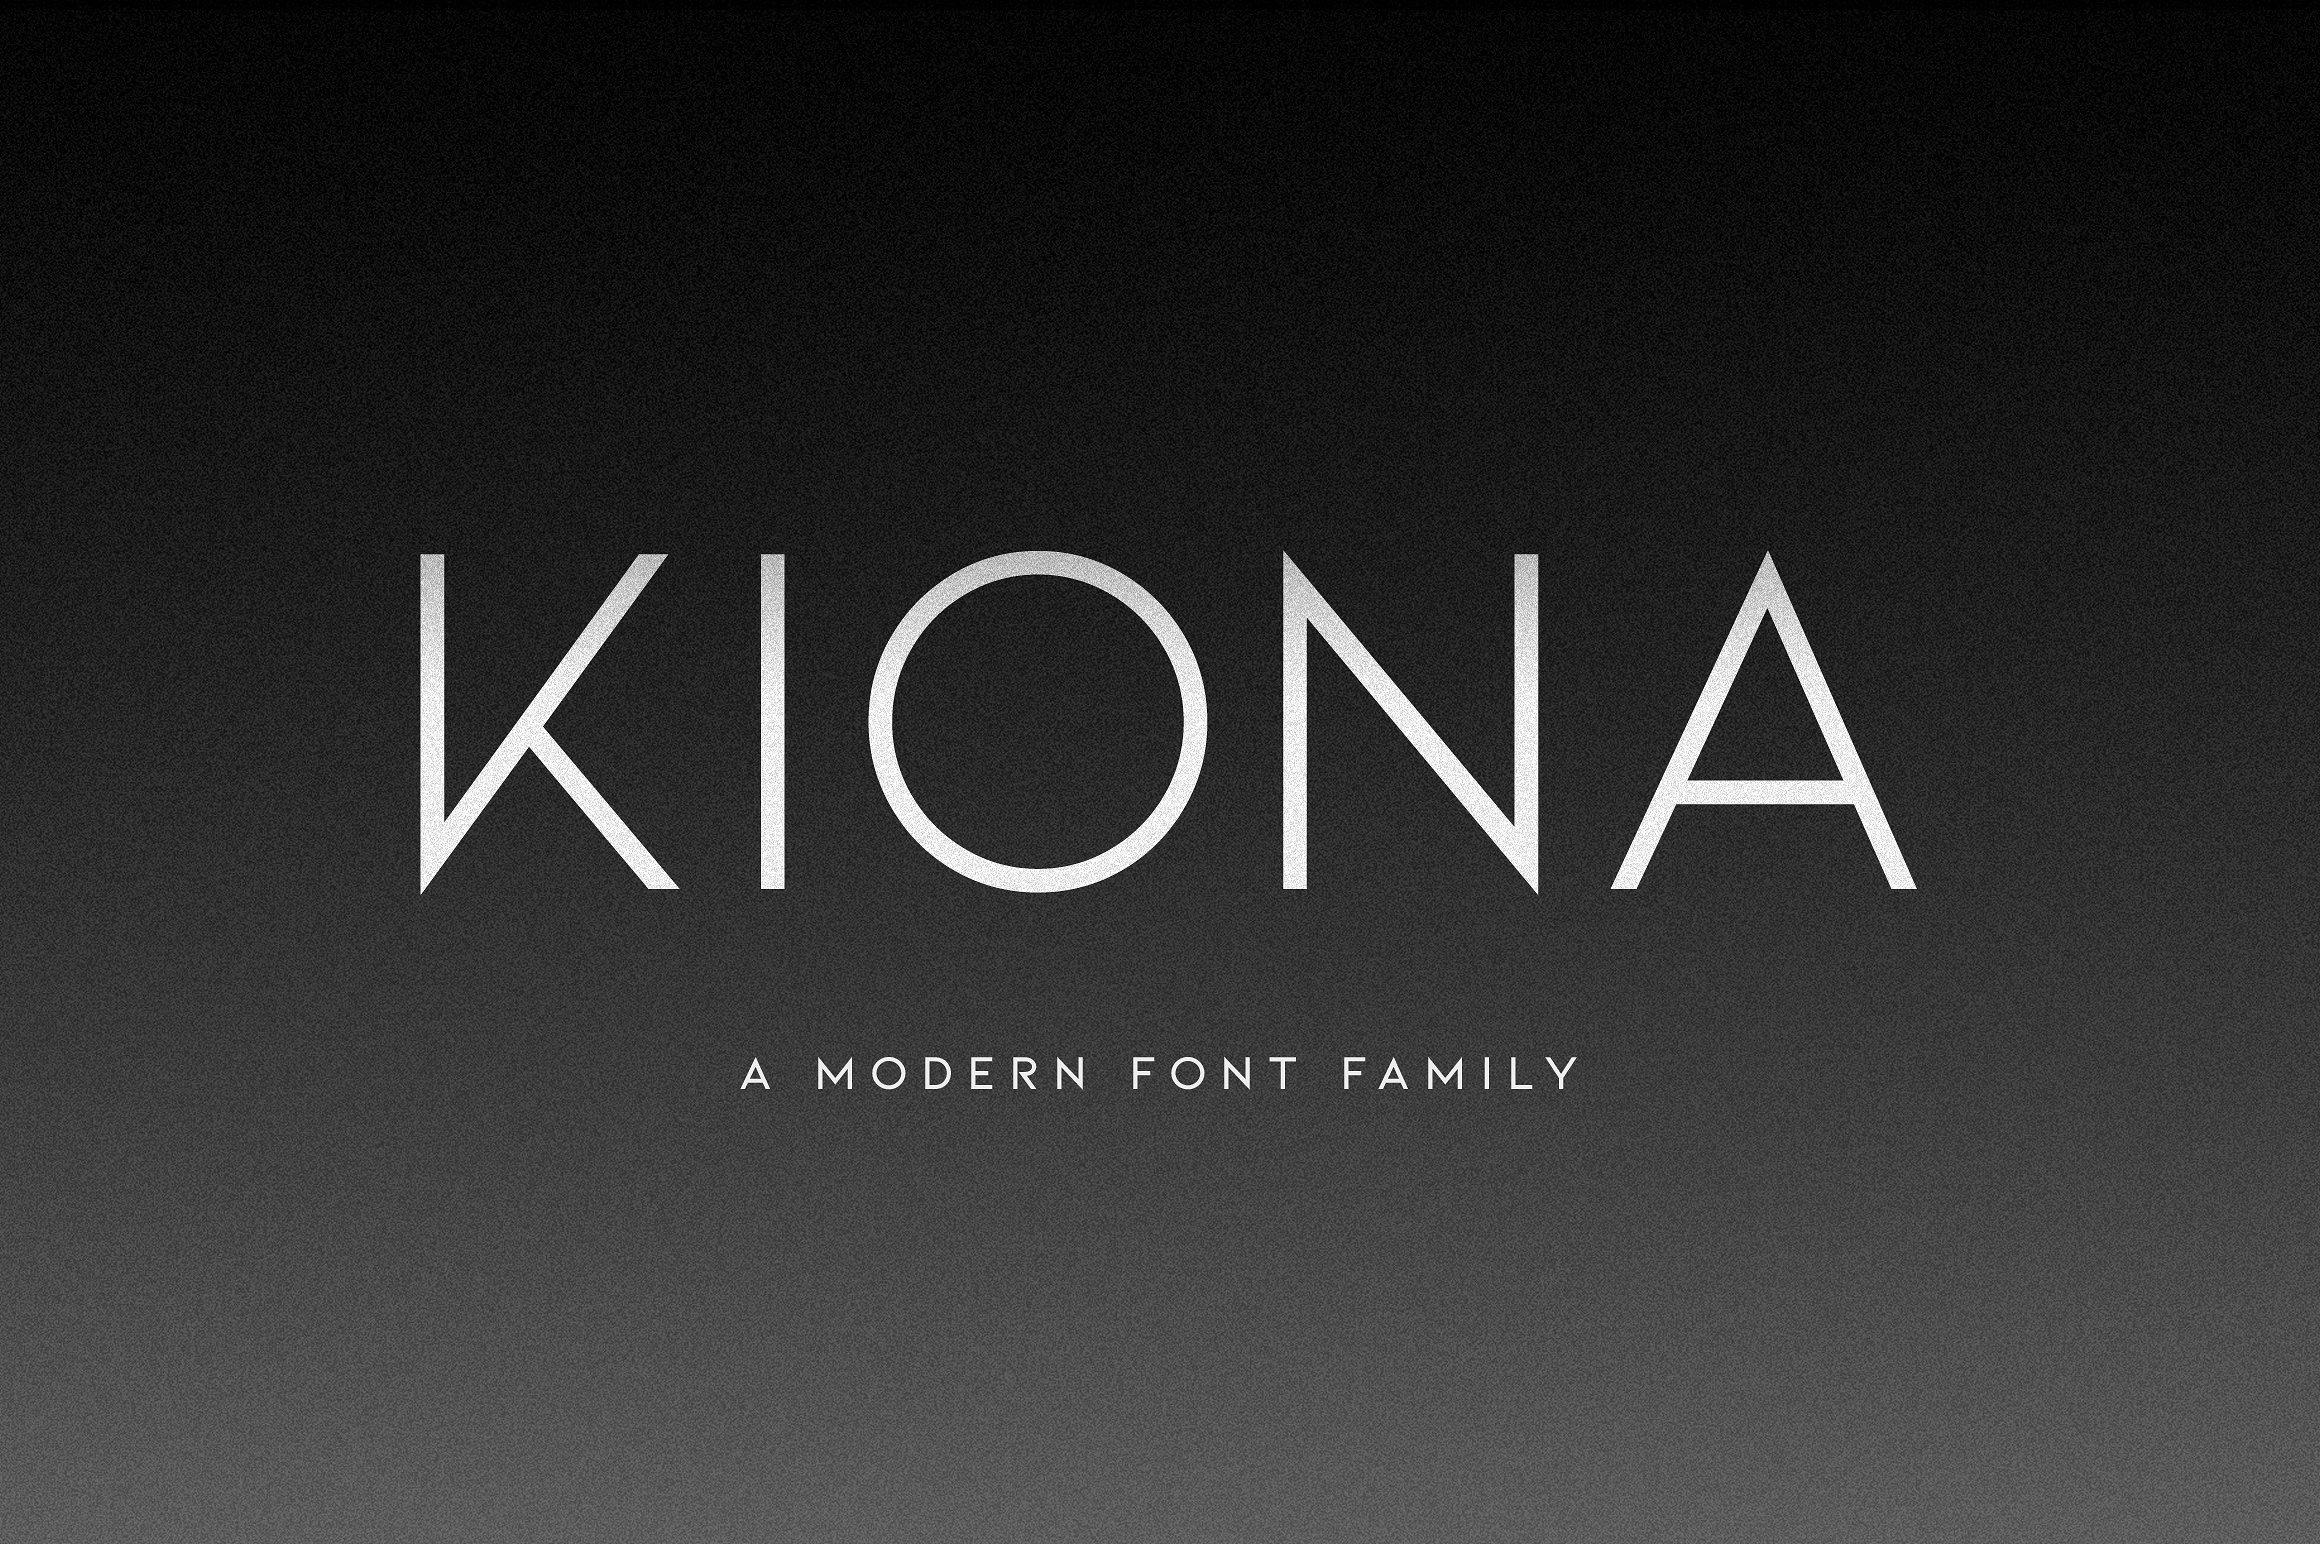 Kiona - A modern font example image 1